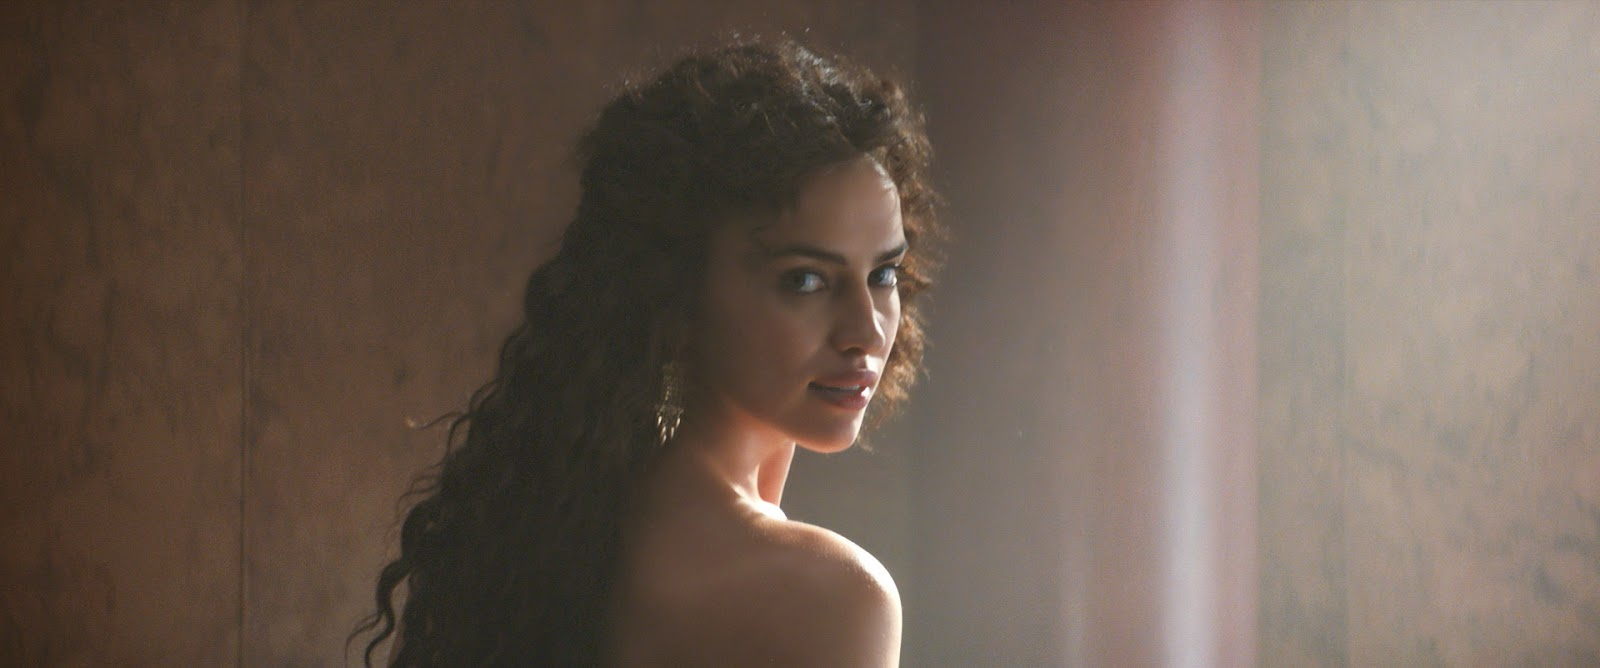 Allie's Entertainment Blog: Russian Model Irina Shayk Is ...